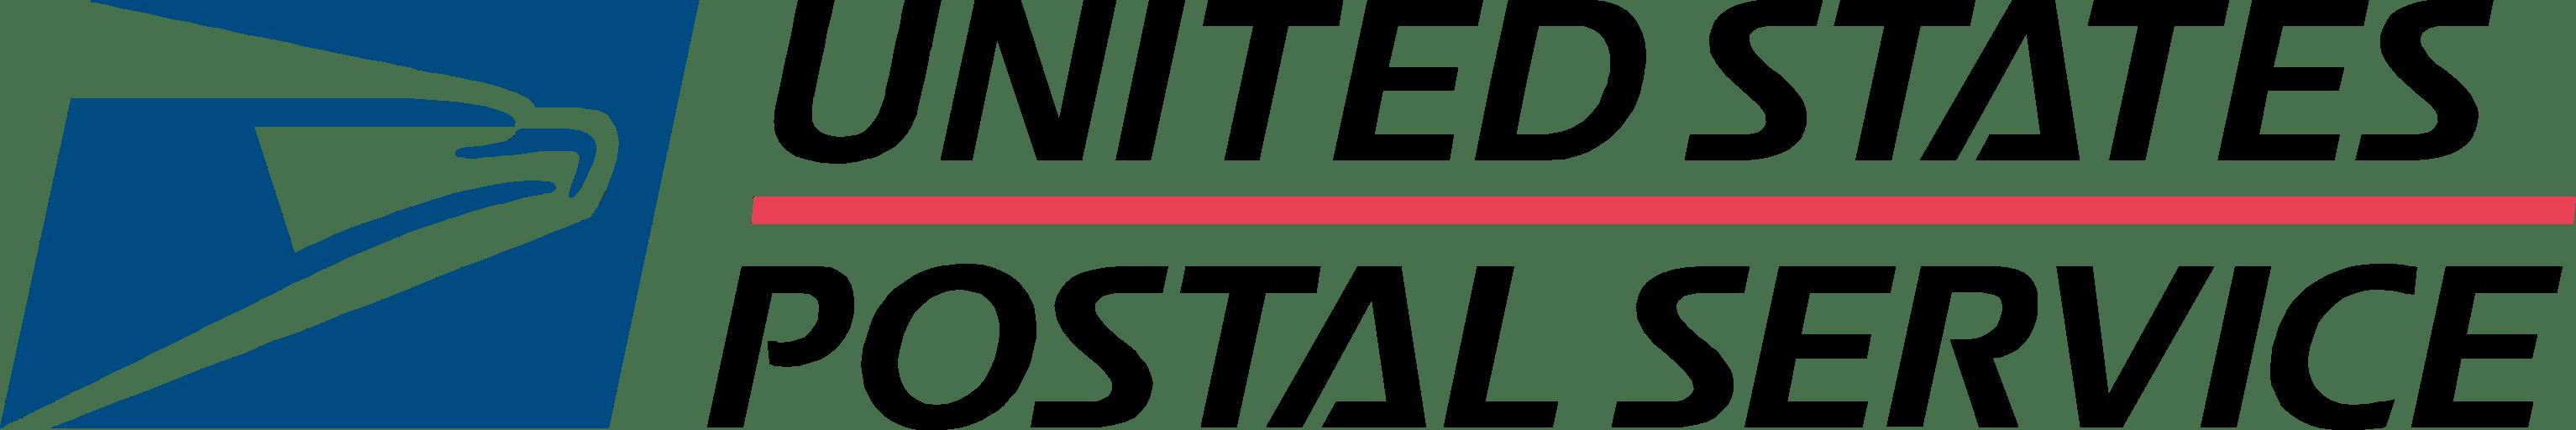 United states postal service clipart image black and white download United States Postal Services USPS Logo transparent PNG ... image black and white download